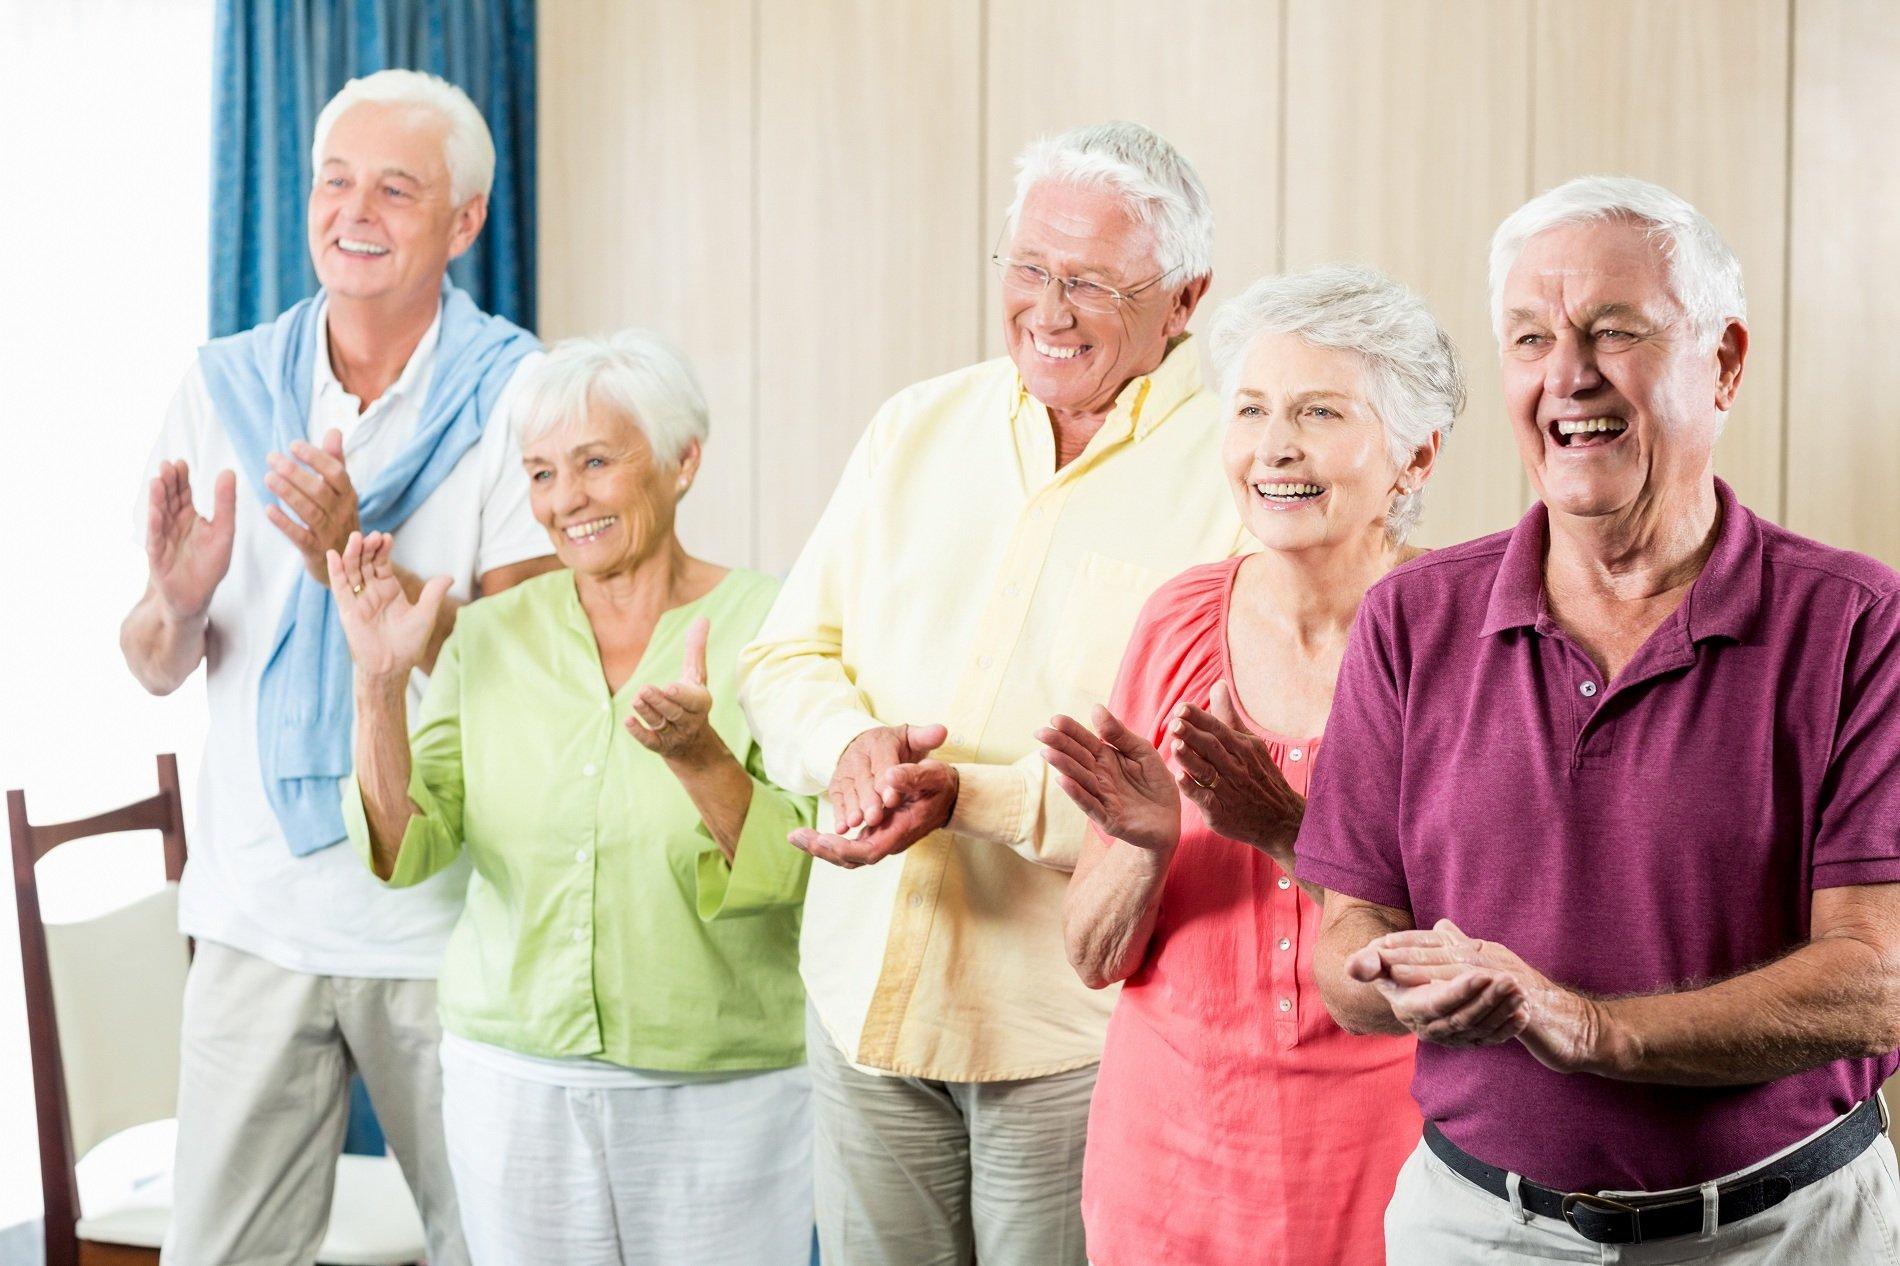 anziani applaudono